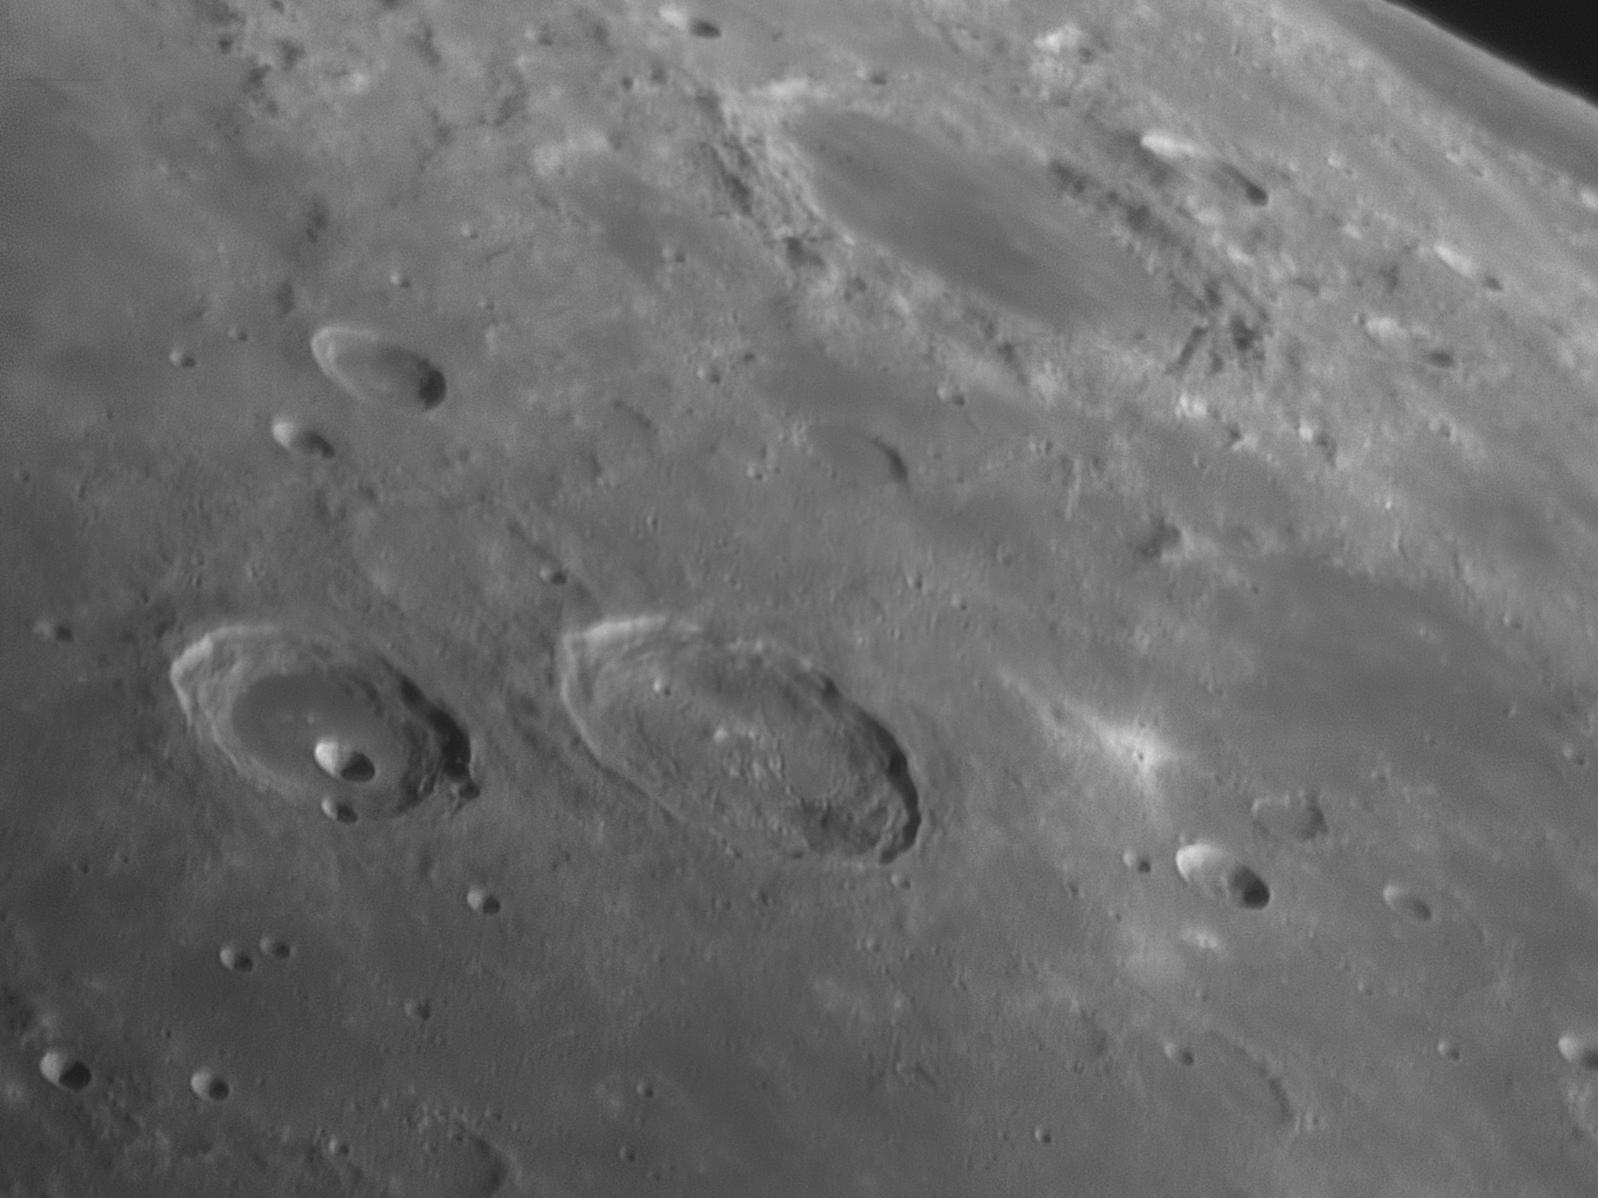 lune1.jpg.e3d1f4a5098461383c16ea14fd757f6e.jpg